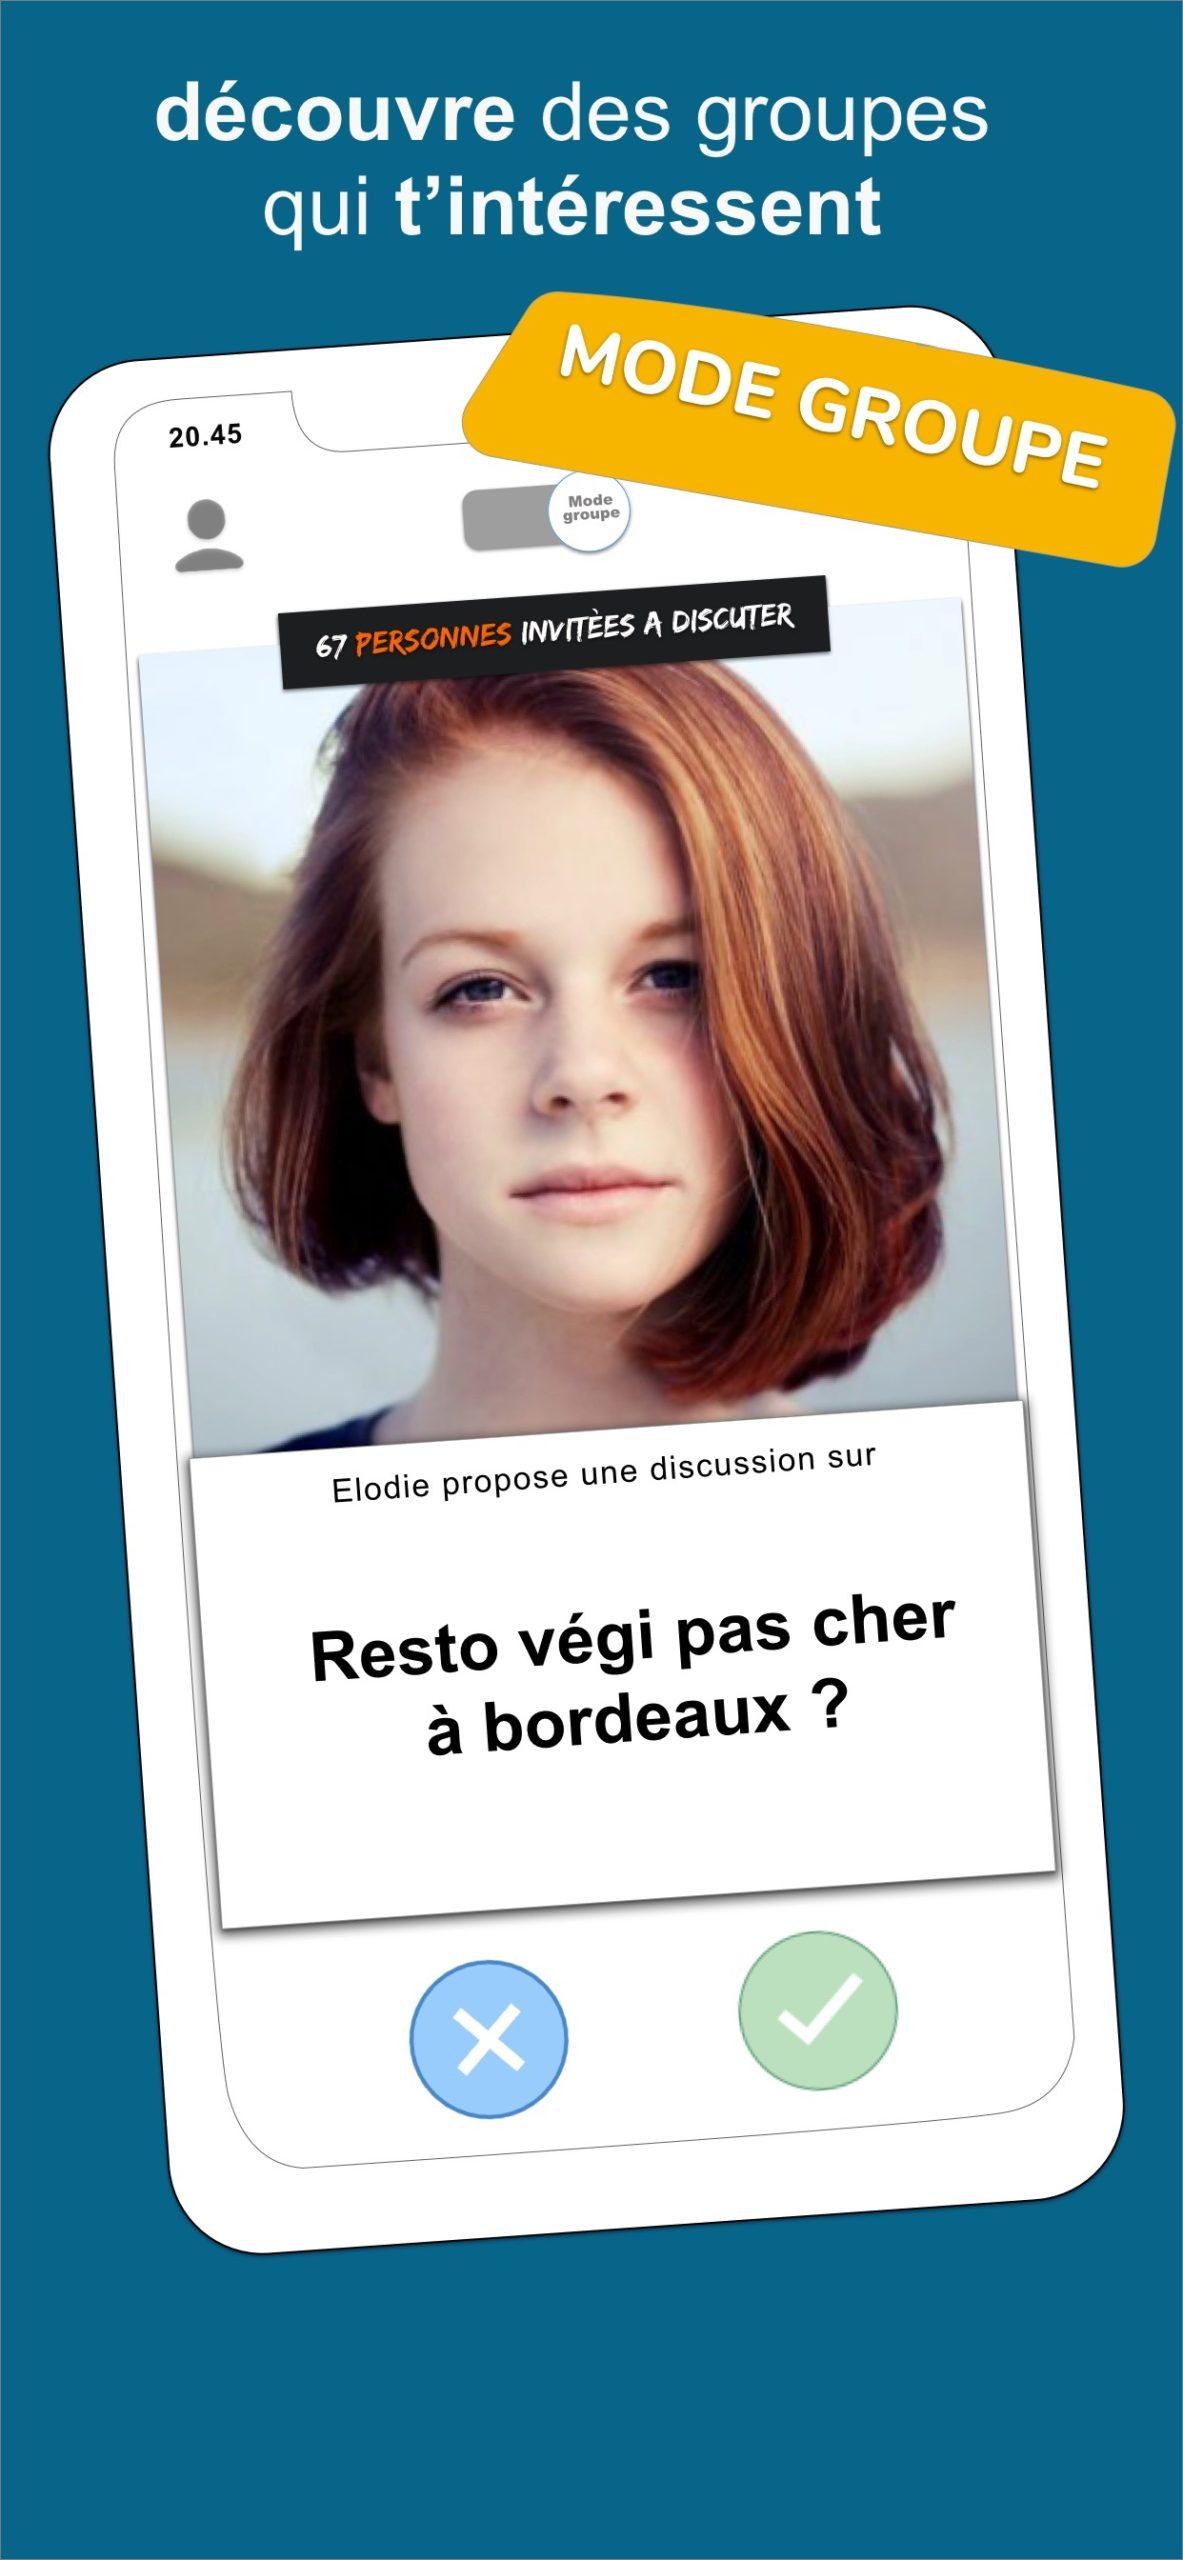 application-iphone-ios-apple-elyot-developpeur-freelance-bordeaux-4